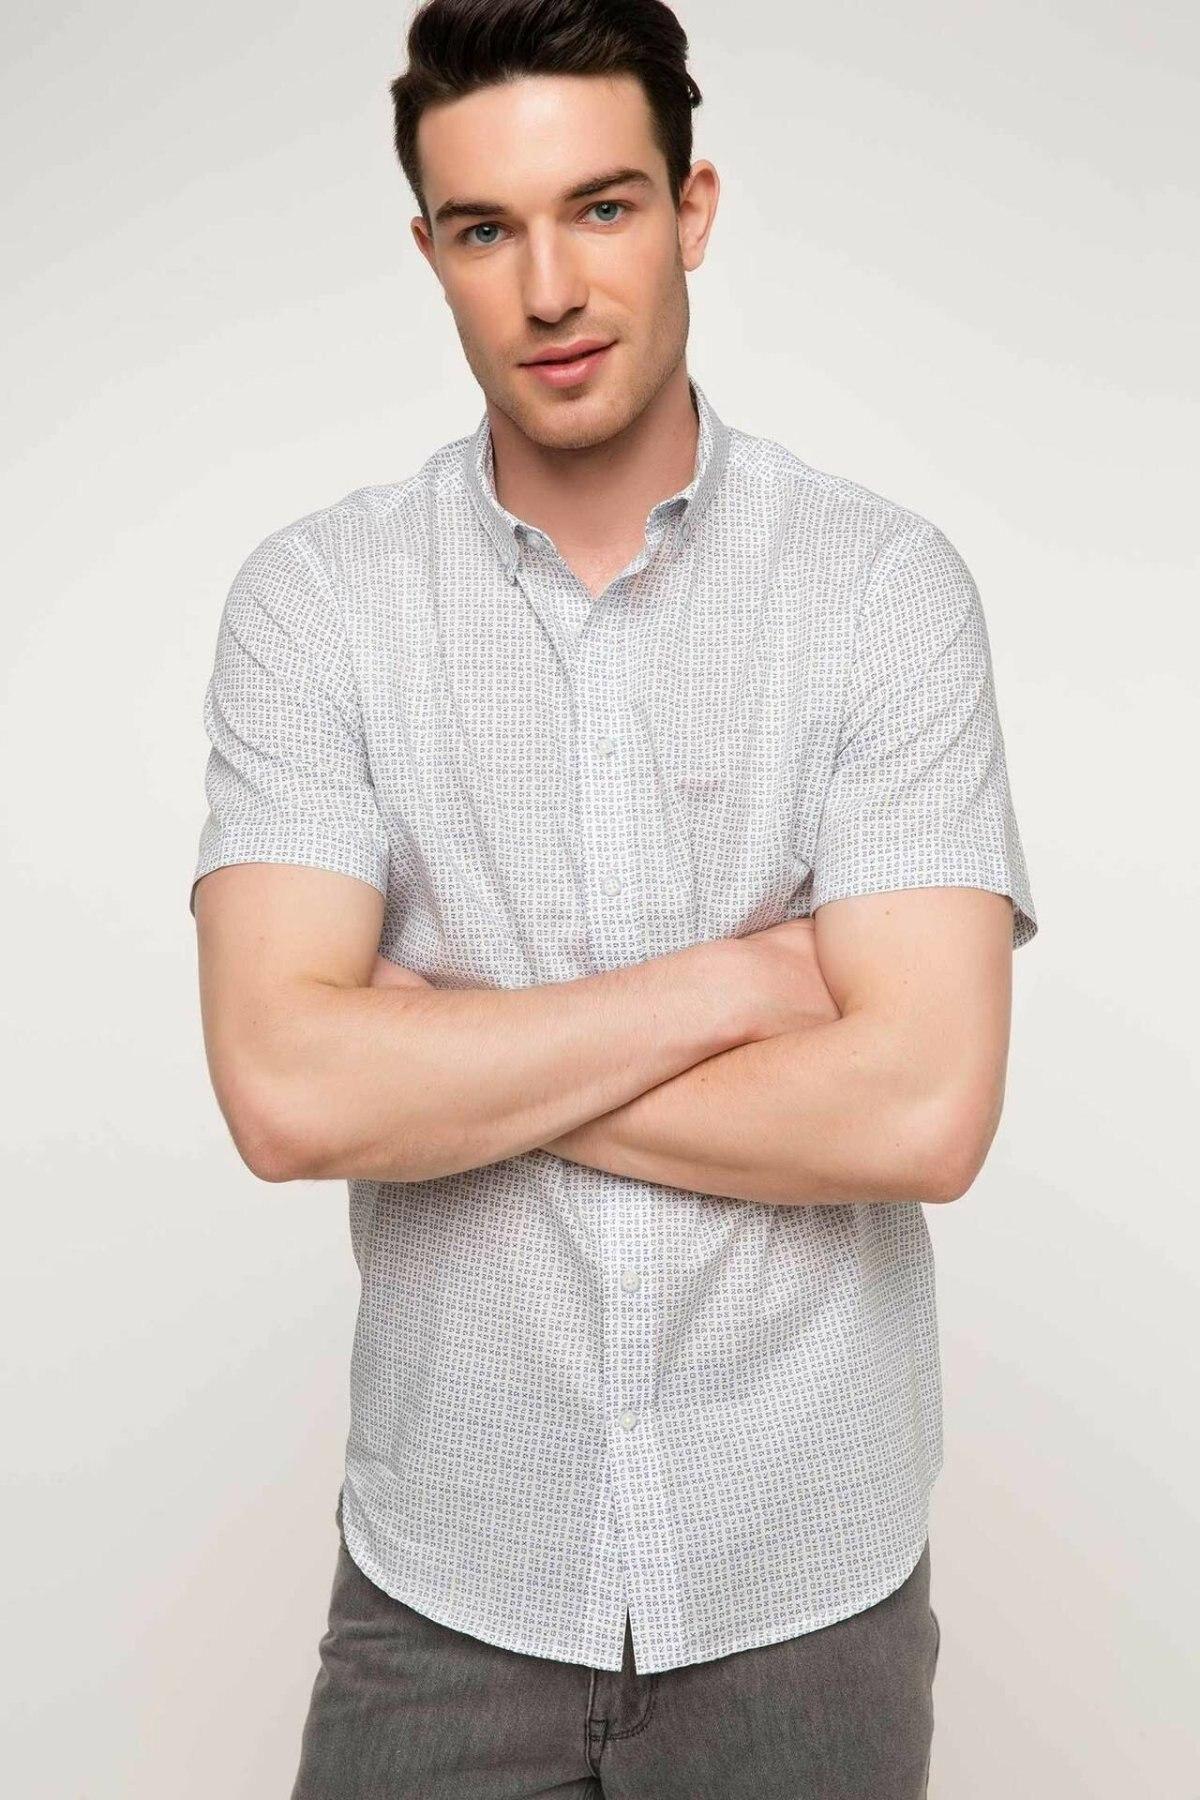 DeFacto Fashion Man Short Sleeve Shirt Male Causal Comfort Print Pattern Tops High Quality Shirts Summer- G7243AZ17SM